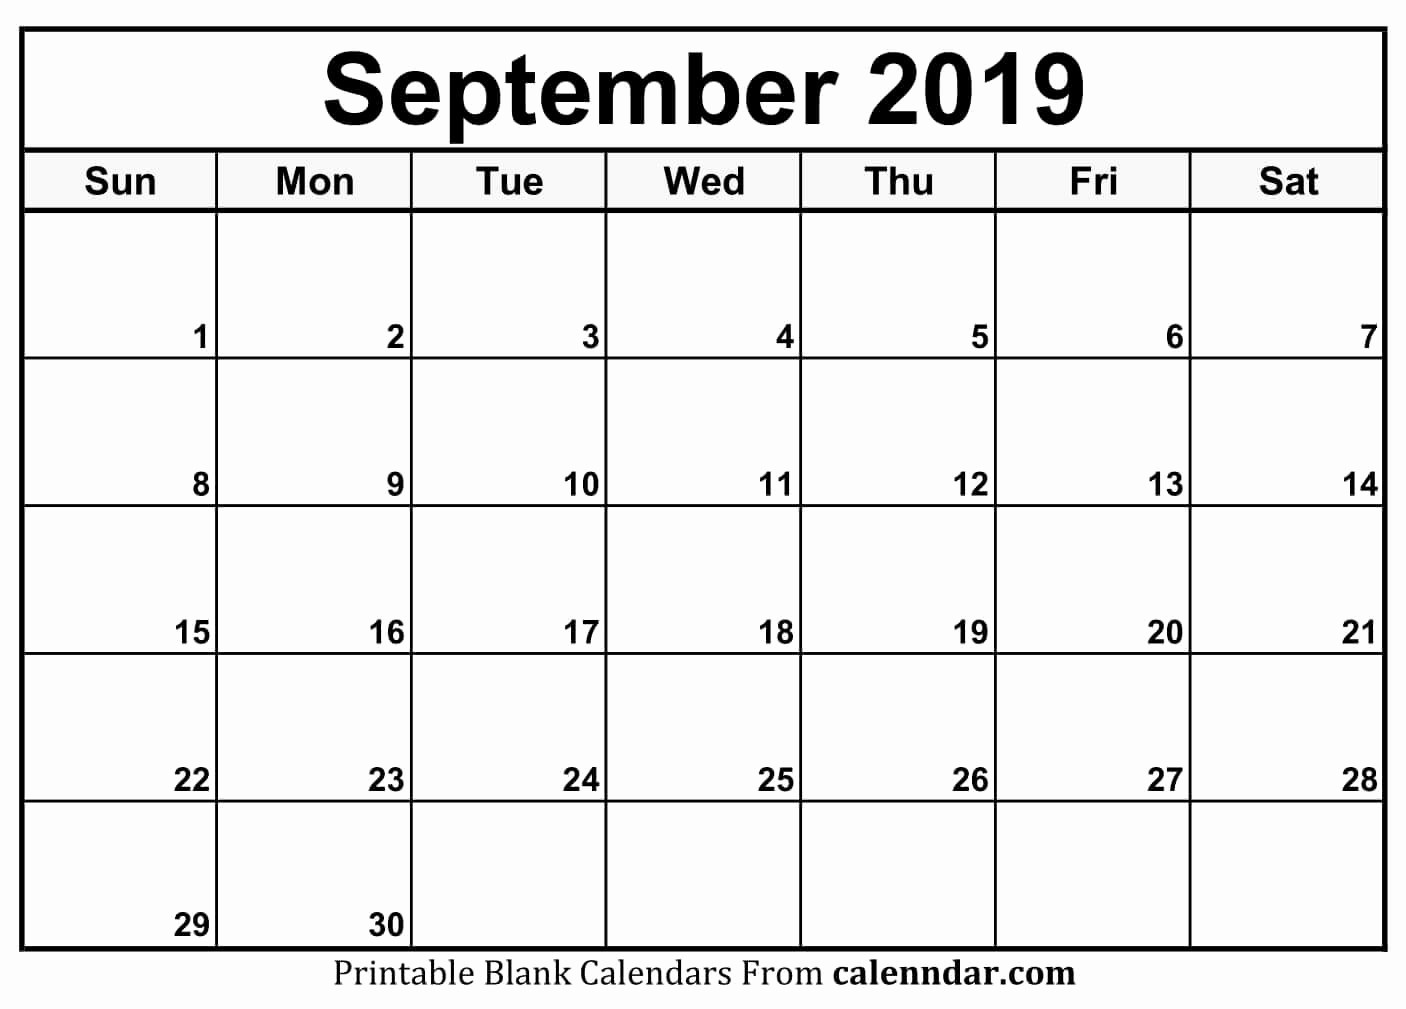 Beautiful 35 Illustration September 2019 Blank Printable-Blank Printable Catholic Calender September